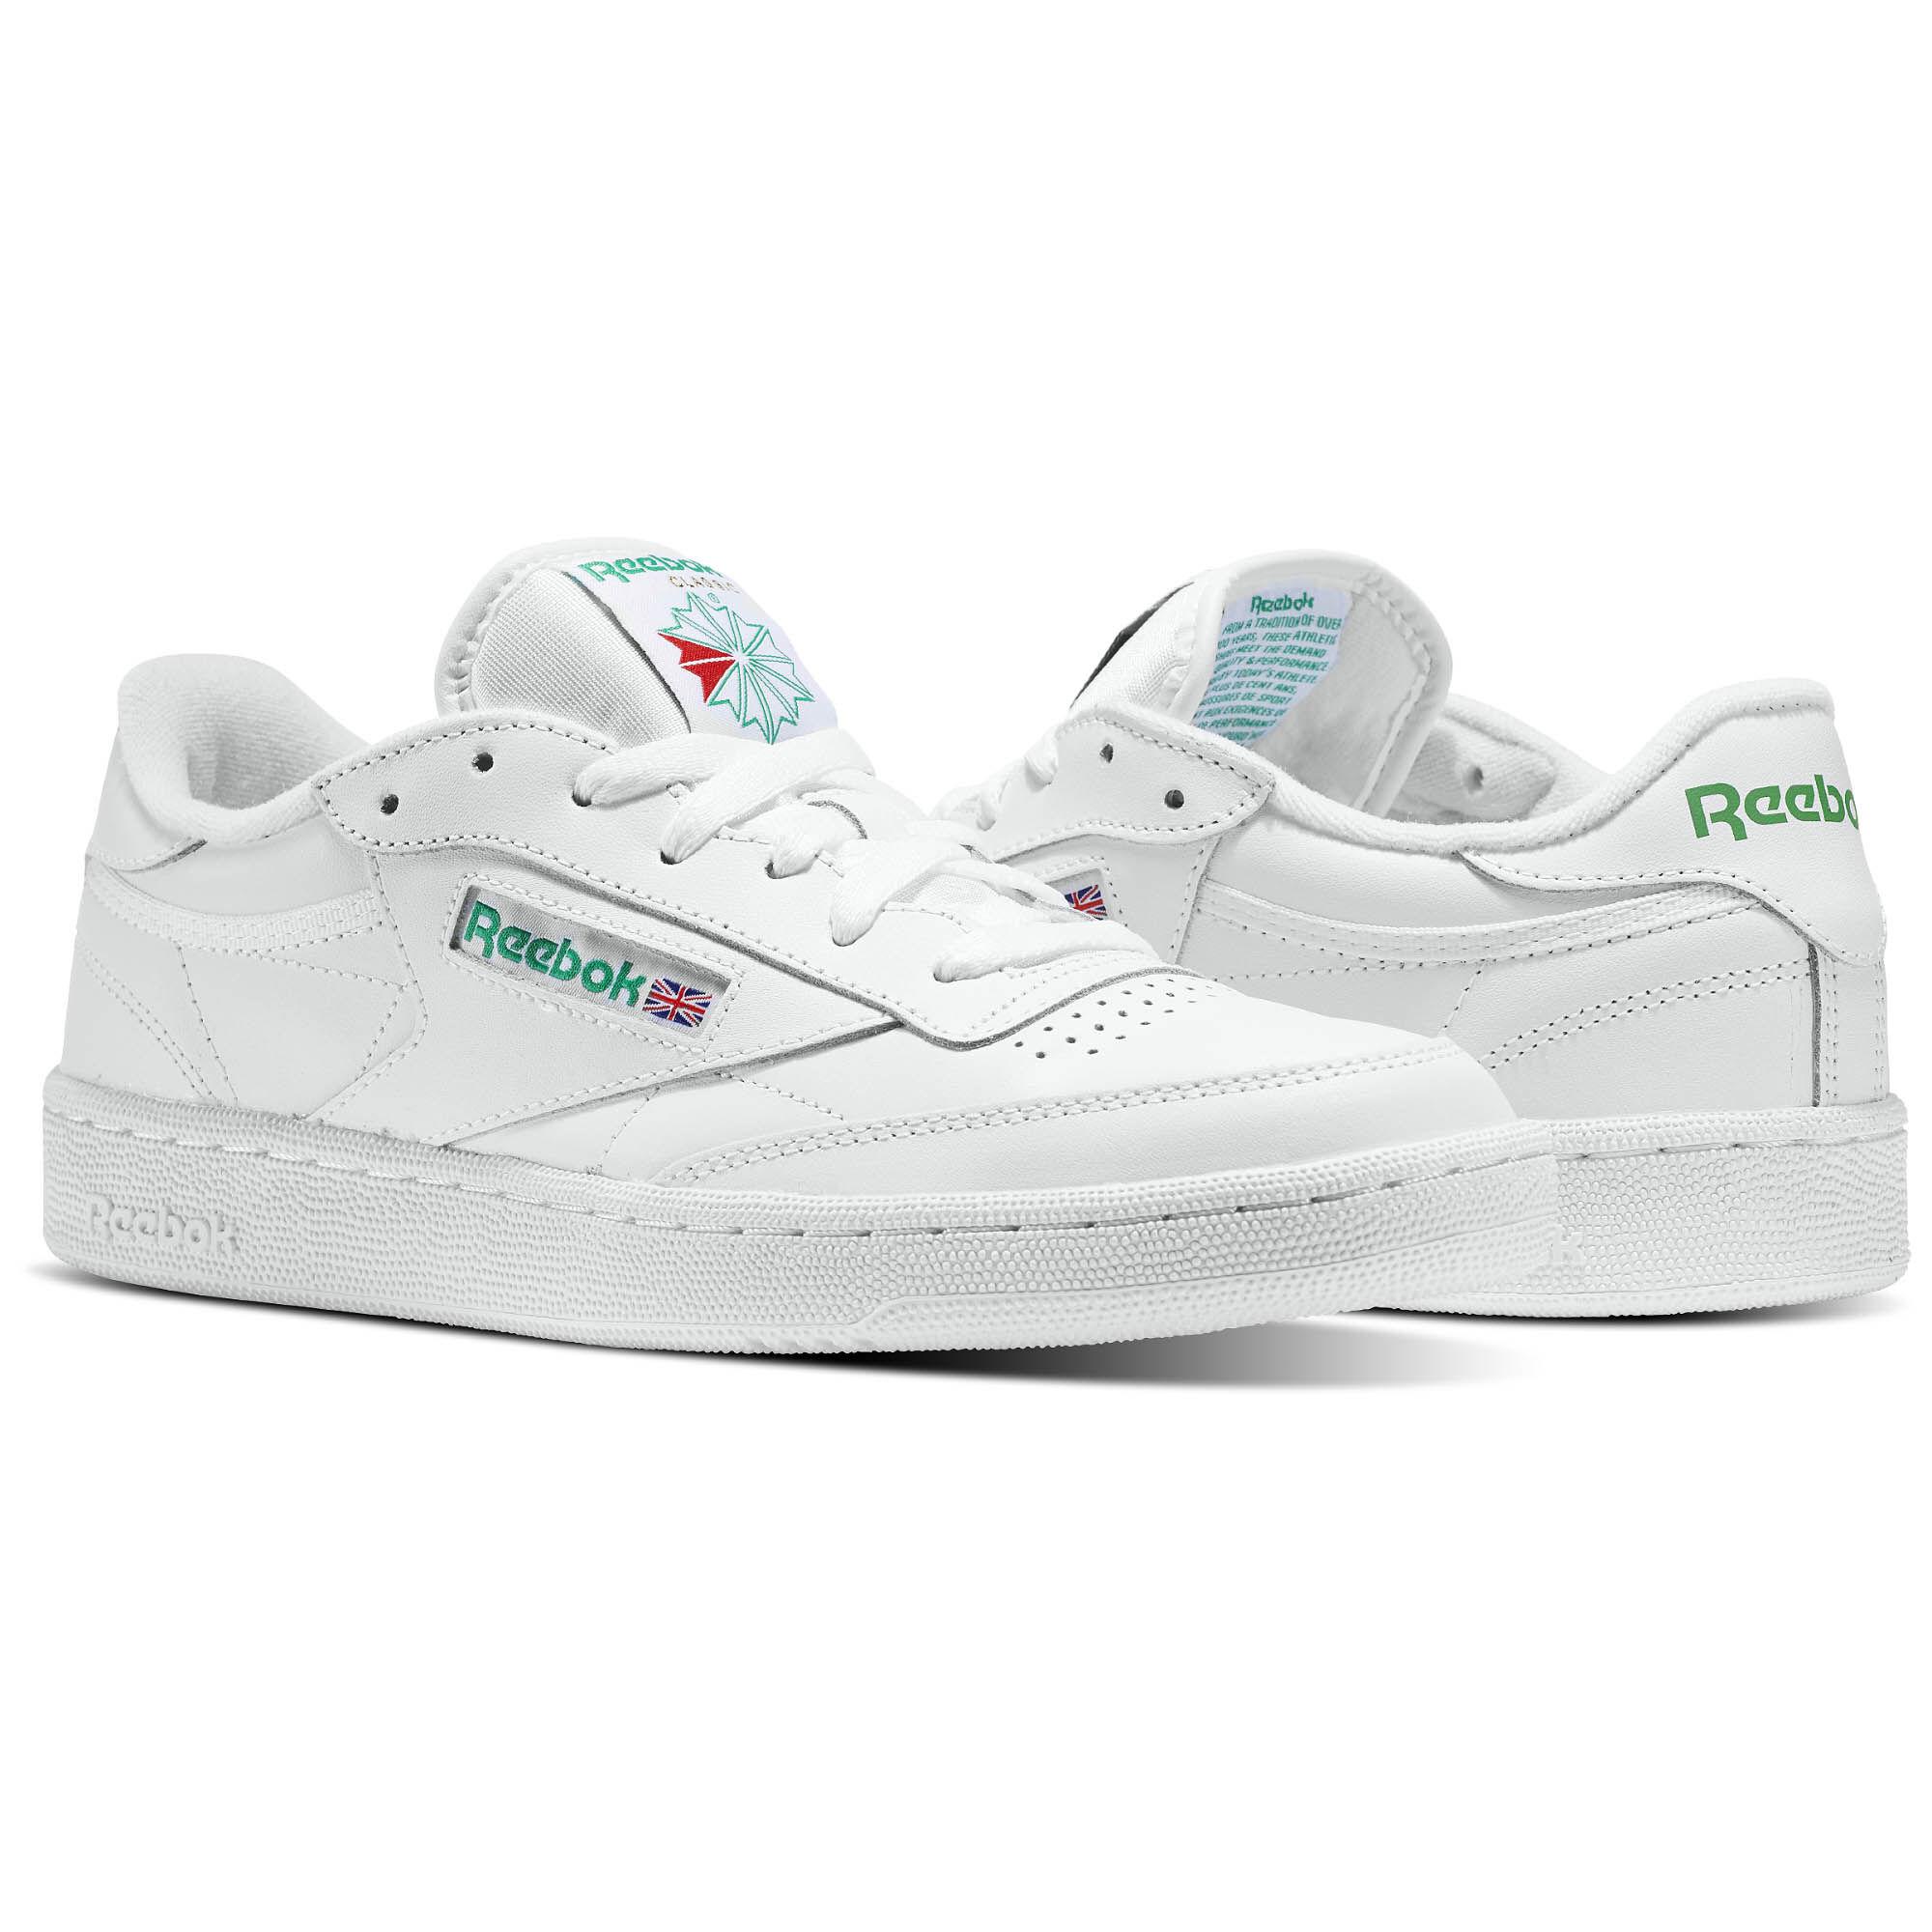 Reebok - Club C 85 Intense White/Green AR0456